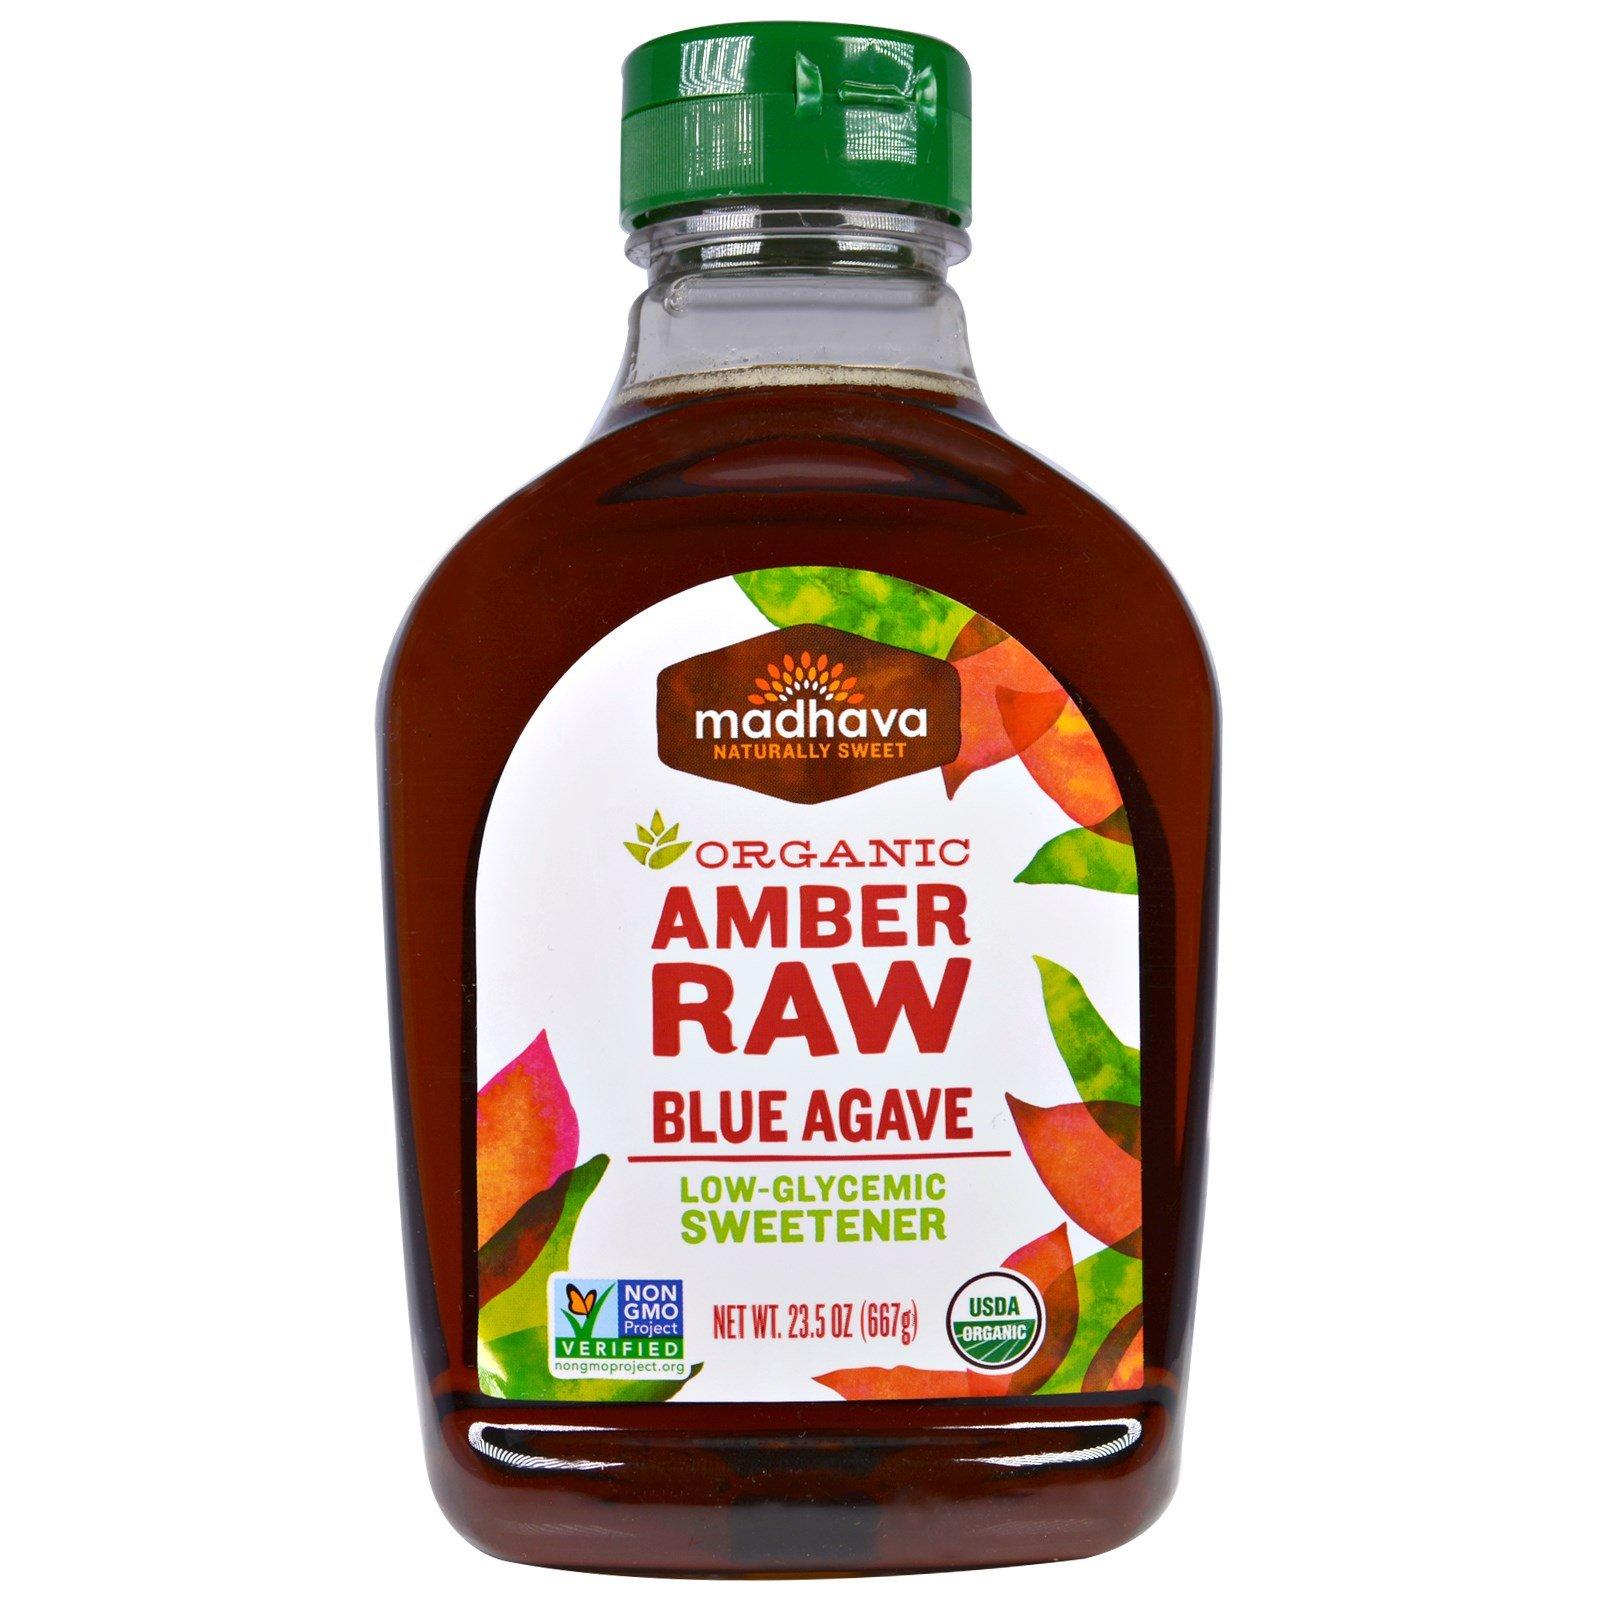 Madhava Natural Sweeteners, Organic Amber Agave Nectar, 23.5 oz (667 g) - 2pcs